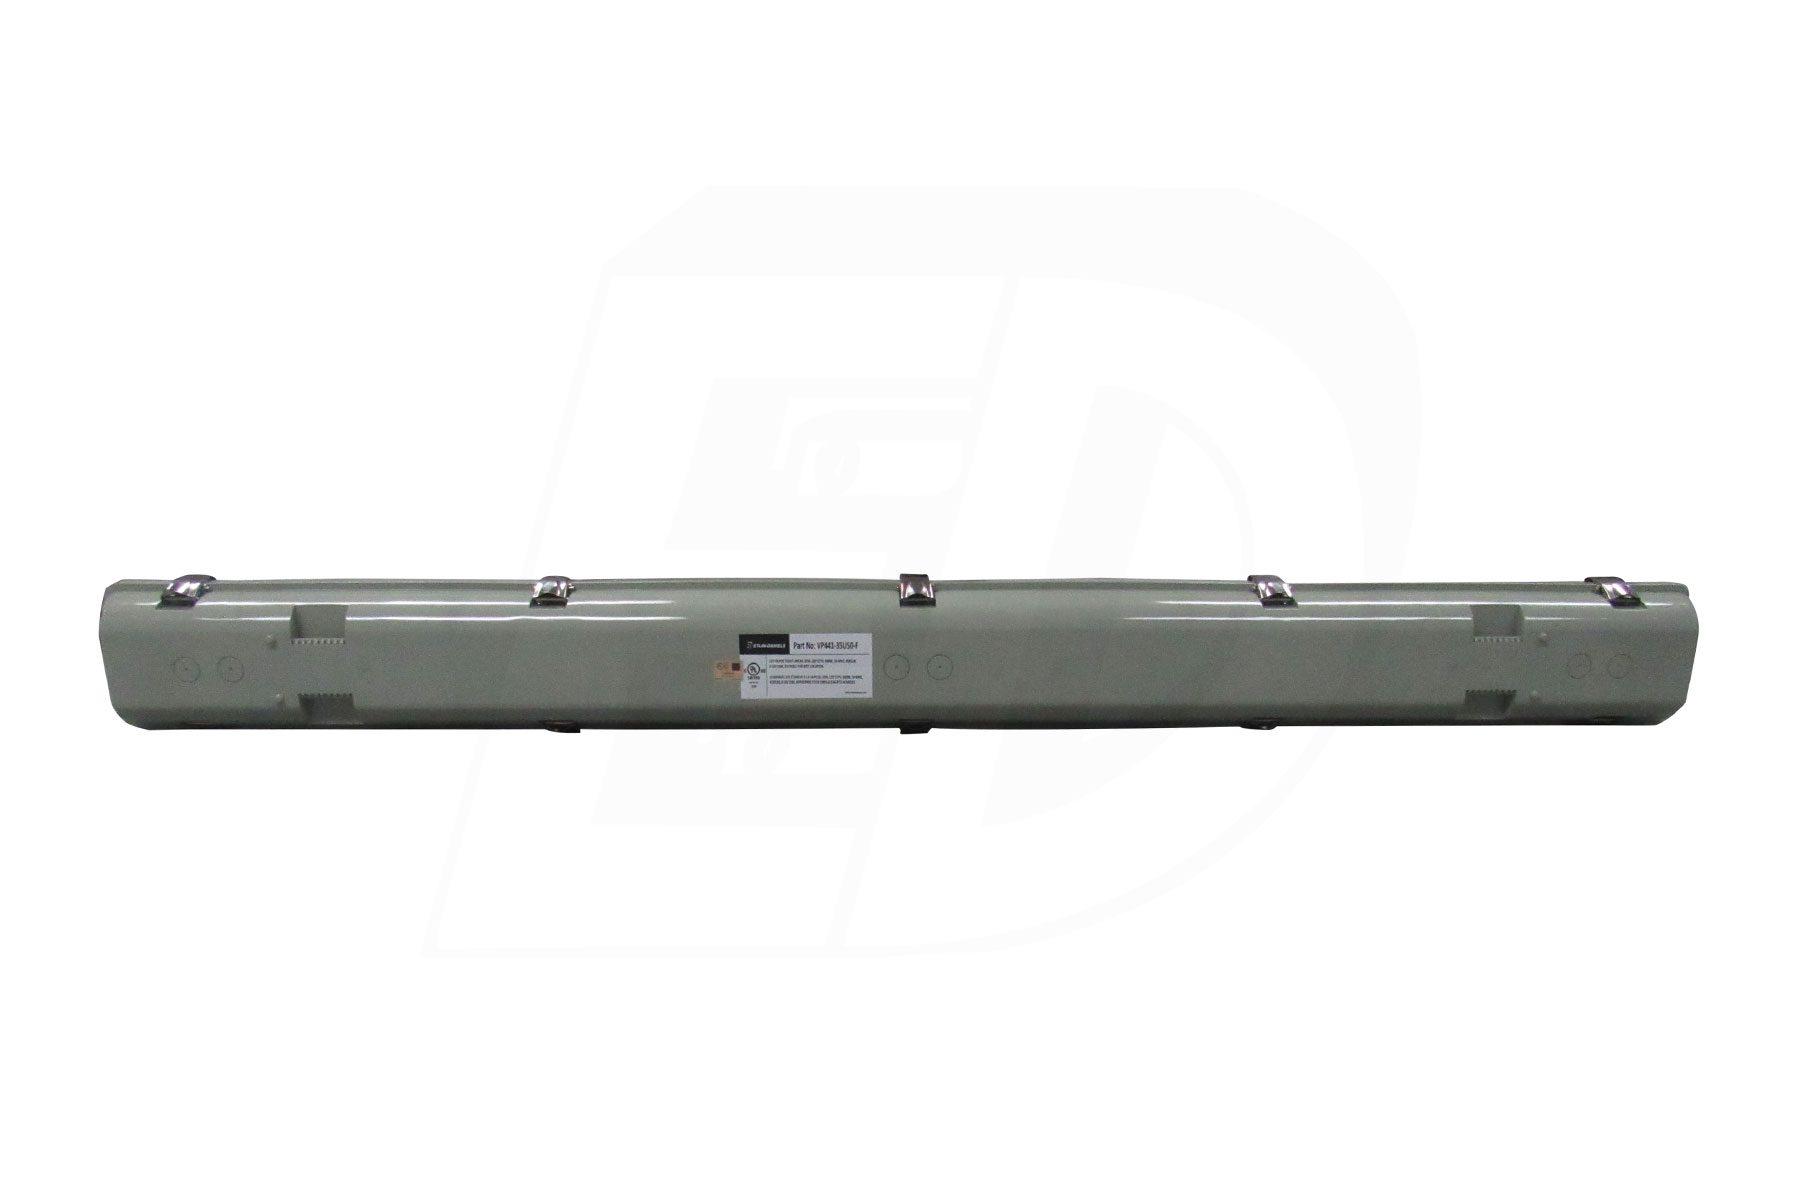 Linear-Vapor-Tight-LED-Lights